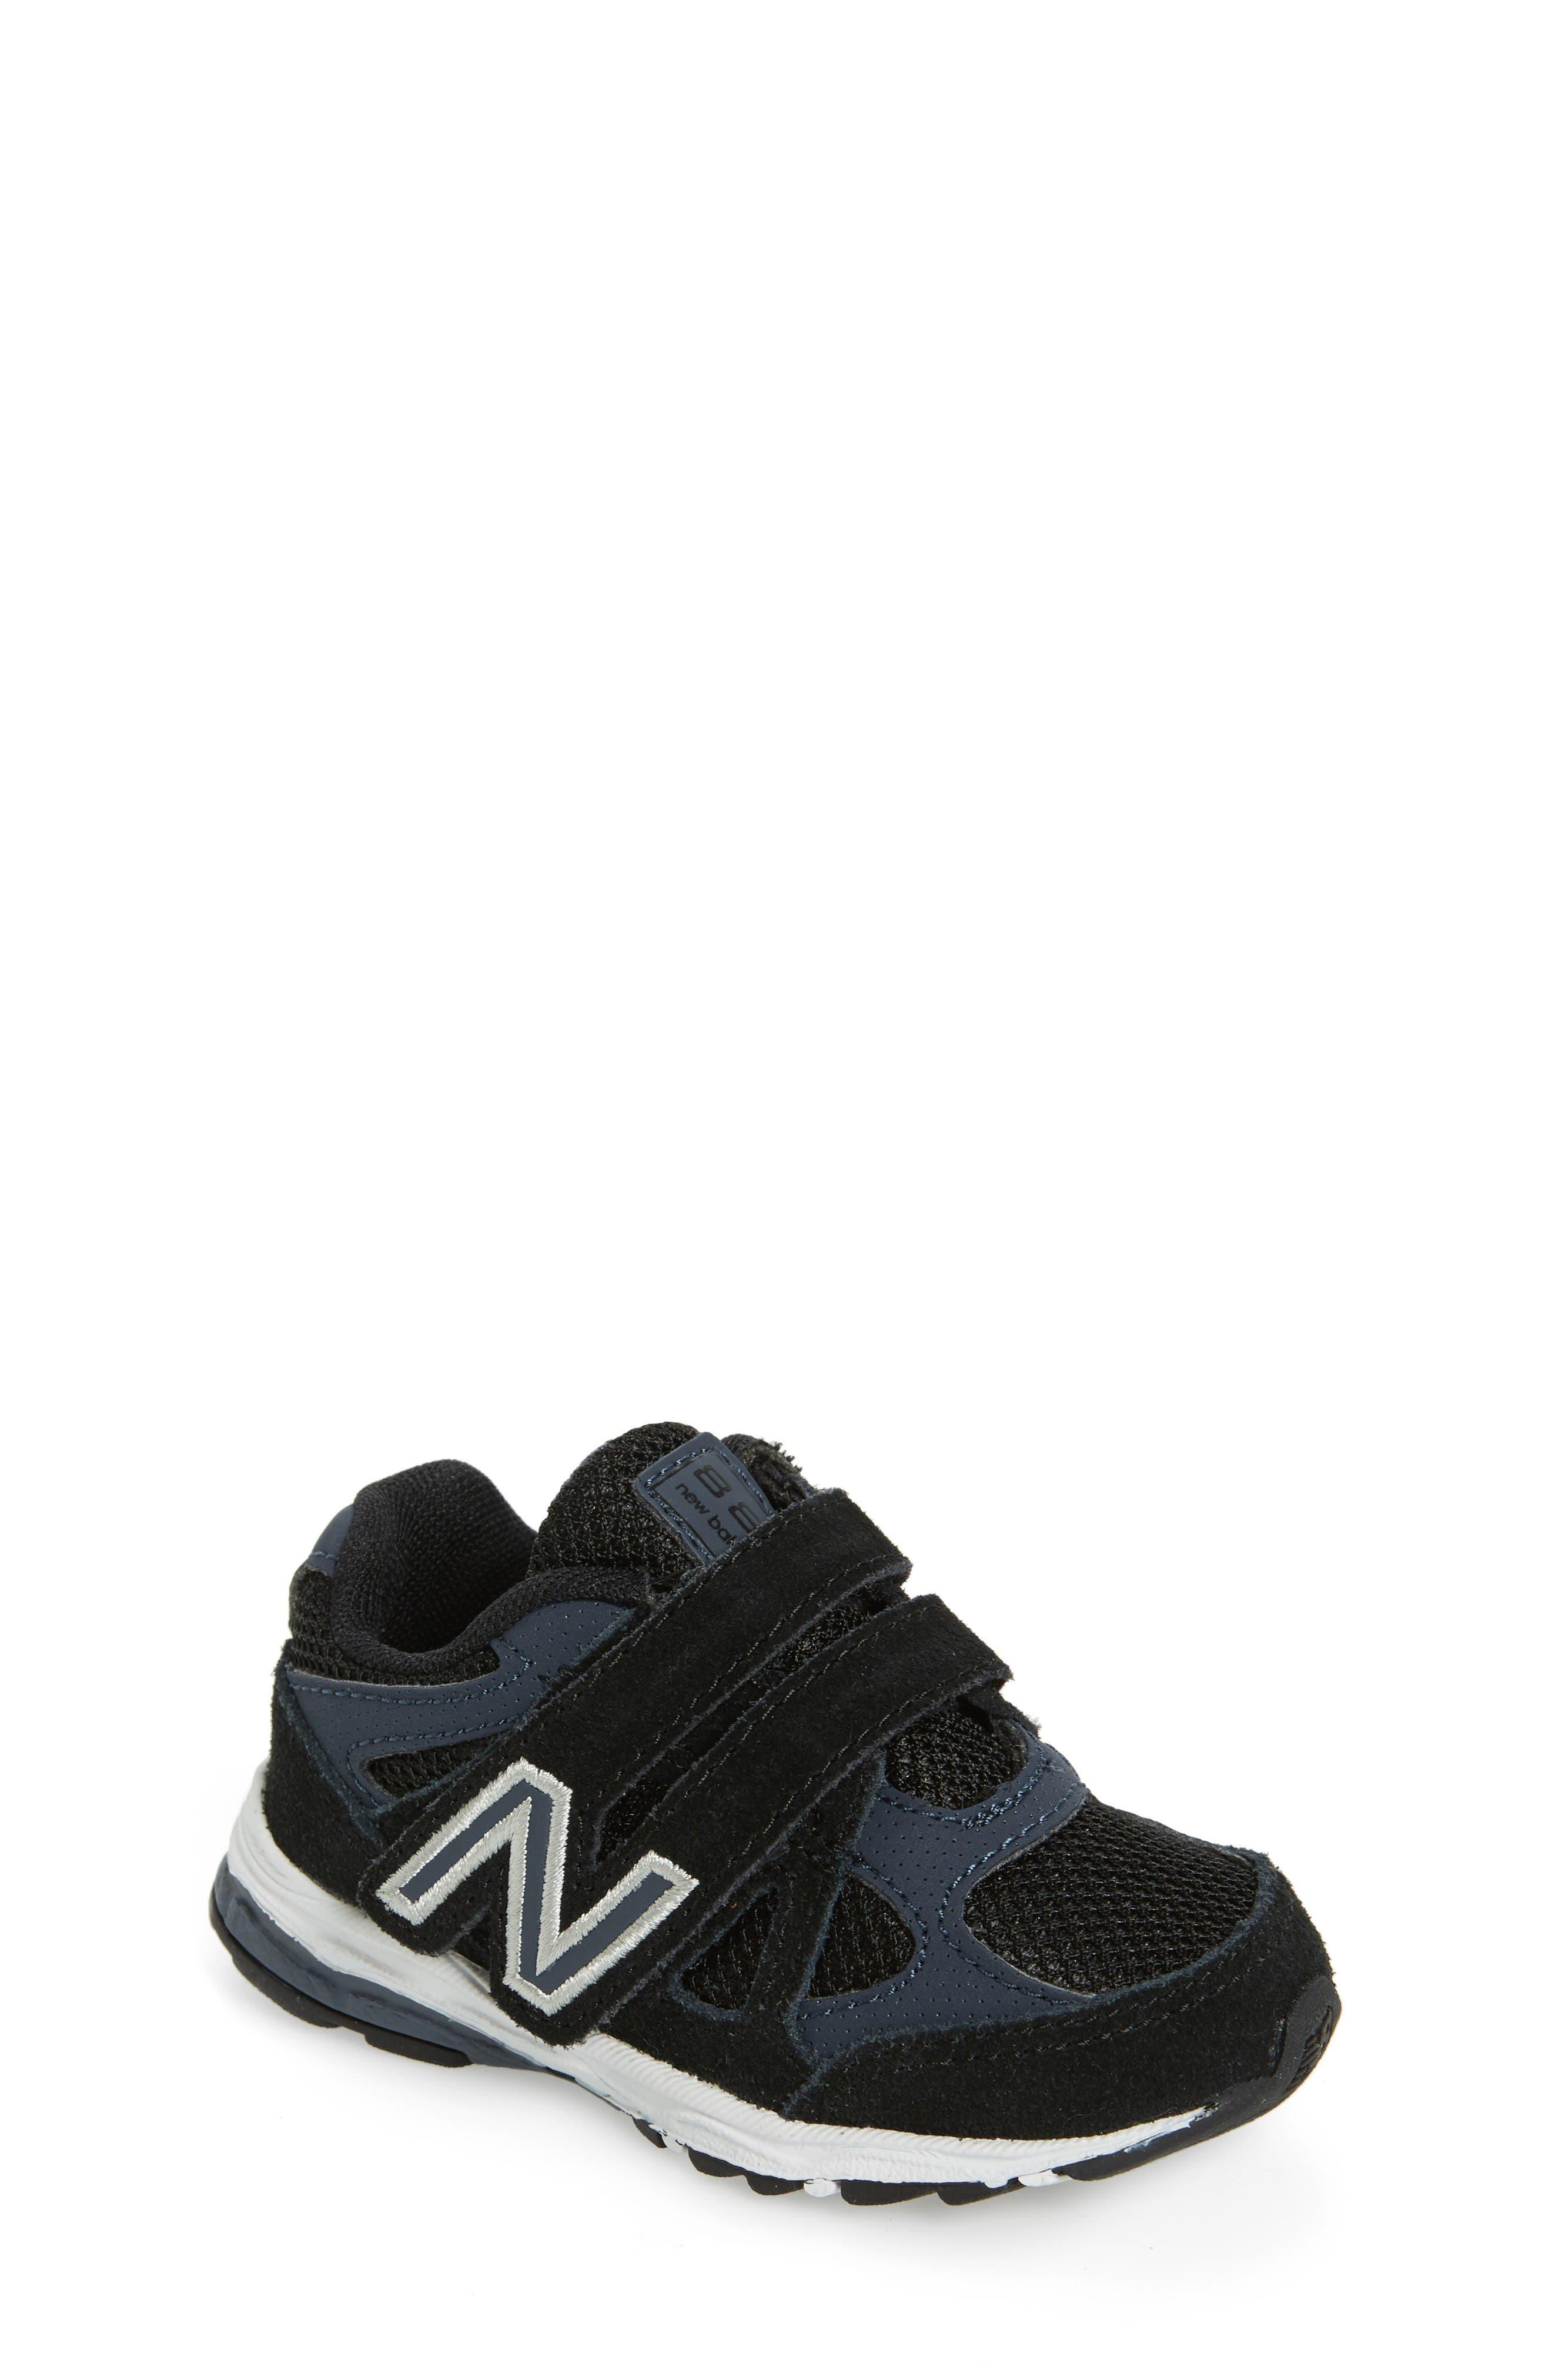 New Balance 888 Sneaker (Baby, Walker, Toddler & Little Kid)